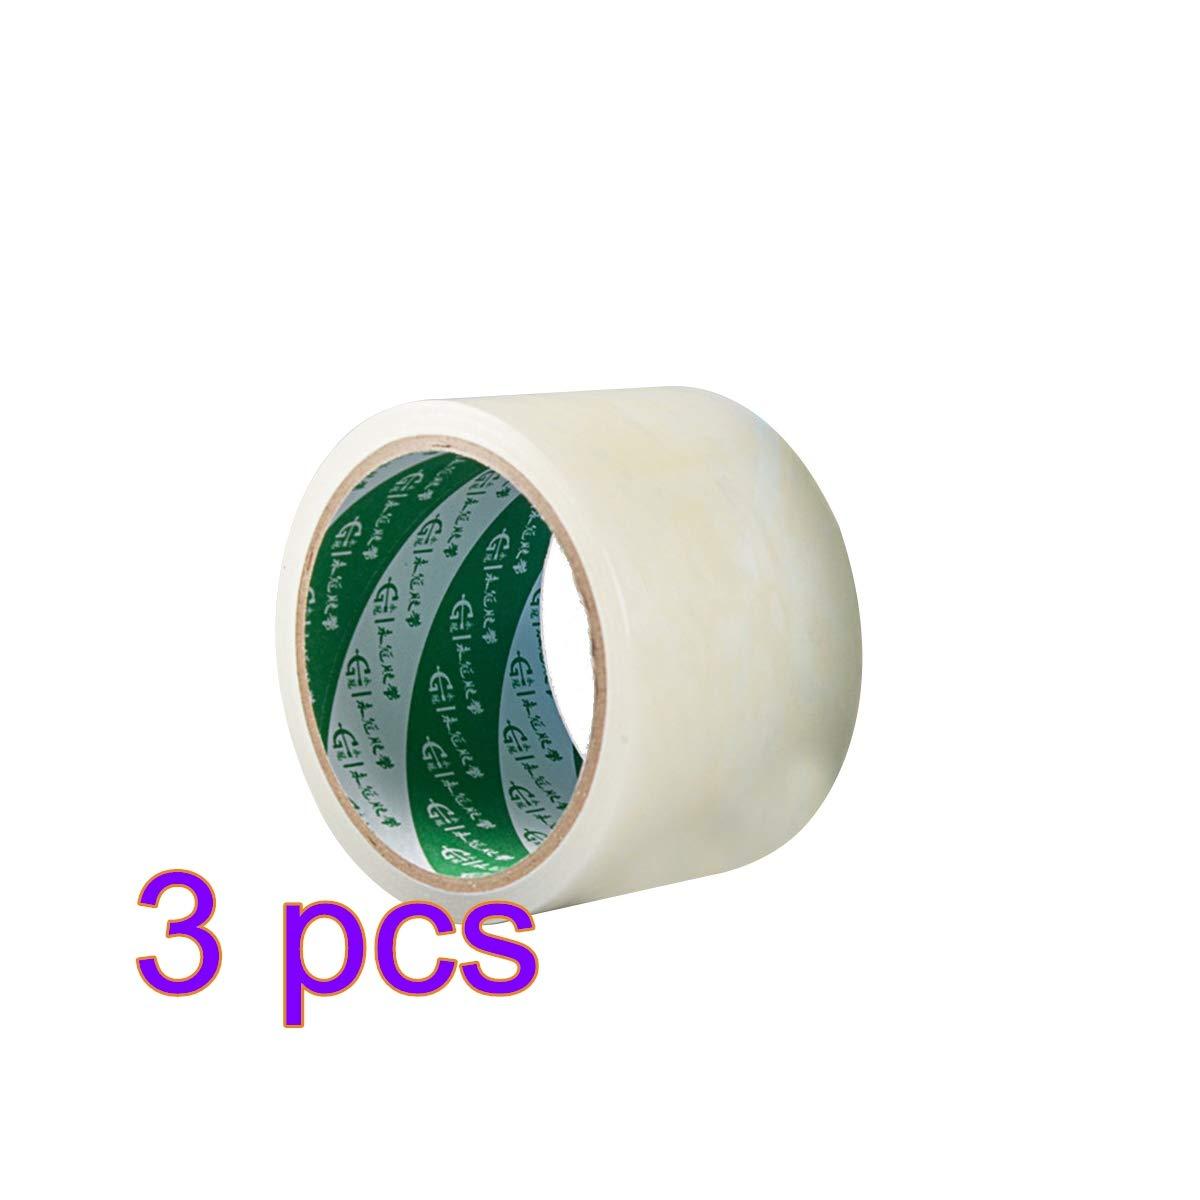 Yardwe 3pcs Farmer Greenhouse Repair Tape Patch Clear Outdoor Poly Repair Tape (White)